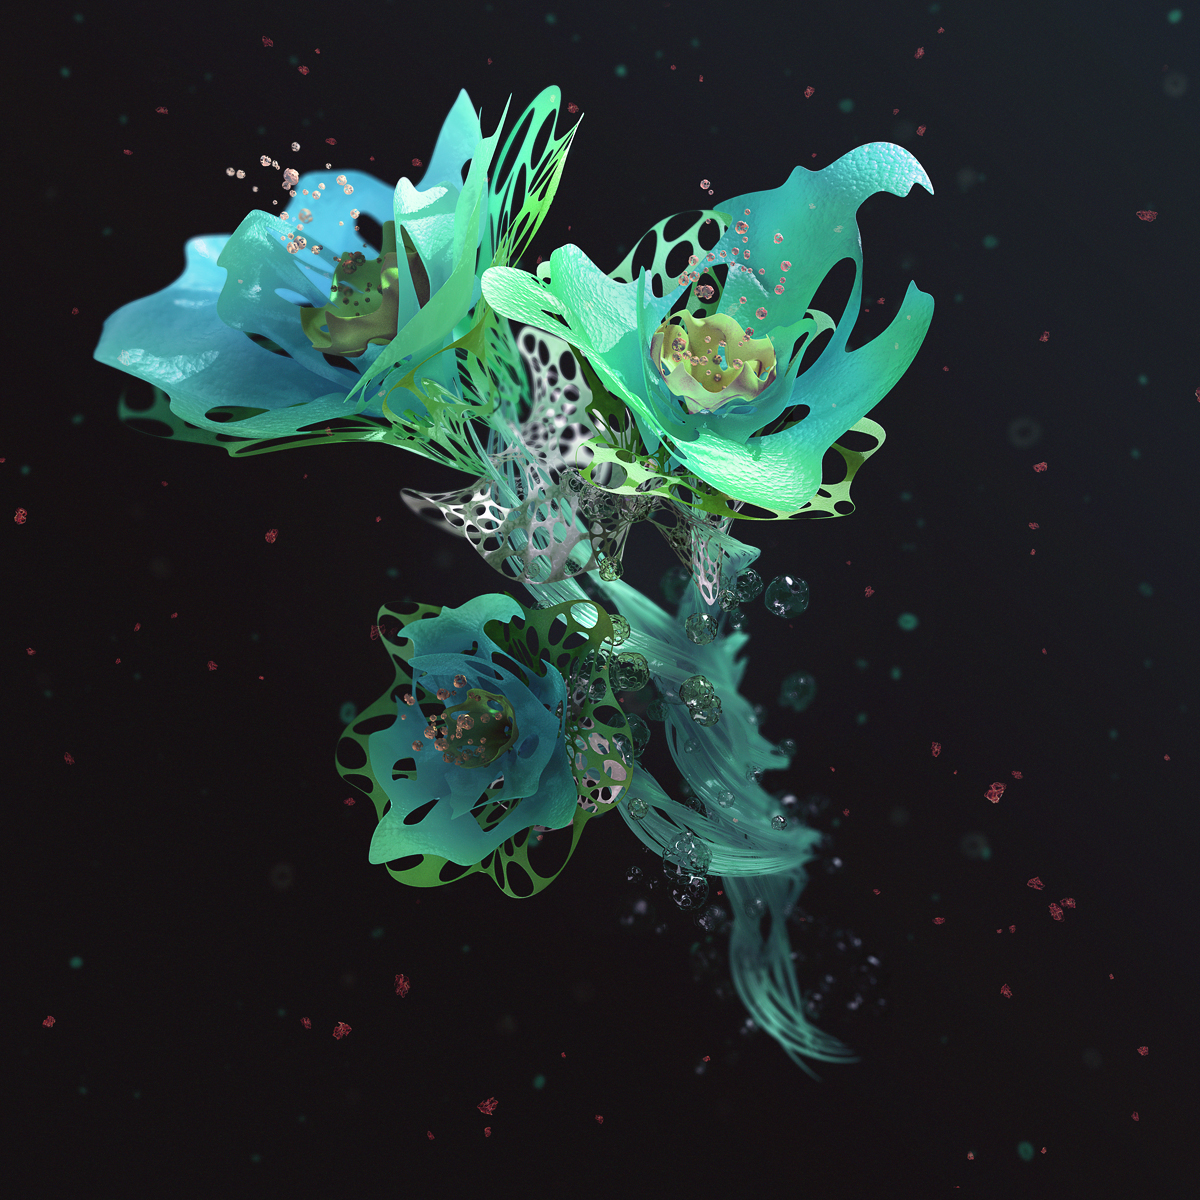 Liliopsid - Bioshap3d 3D project